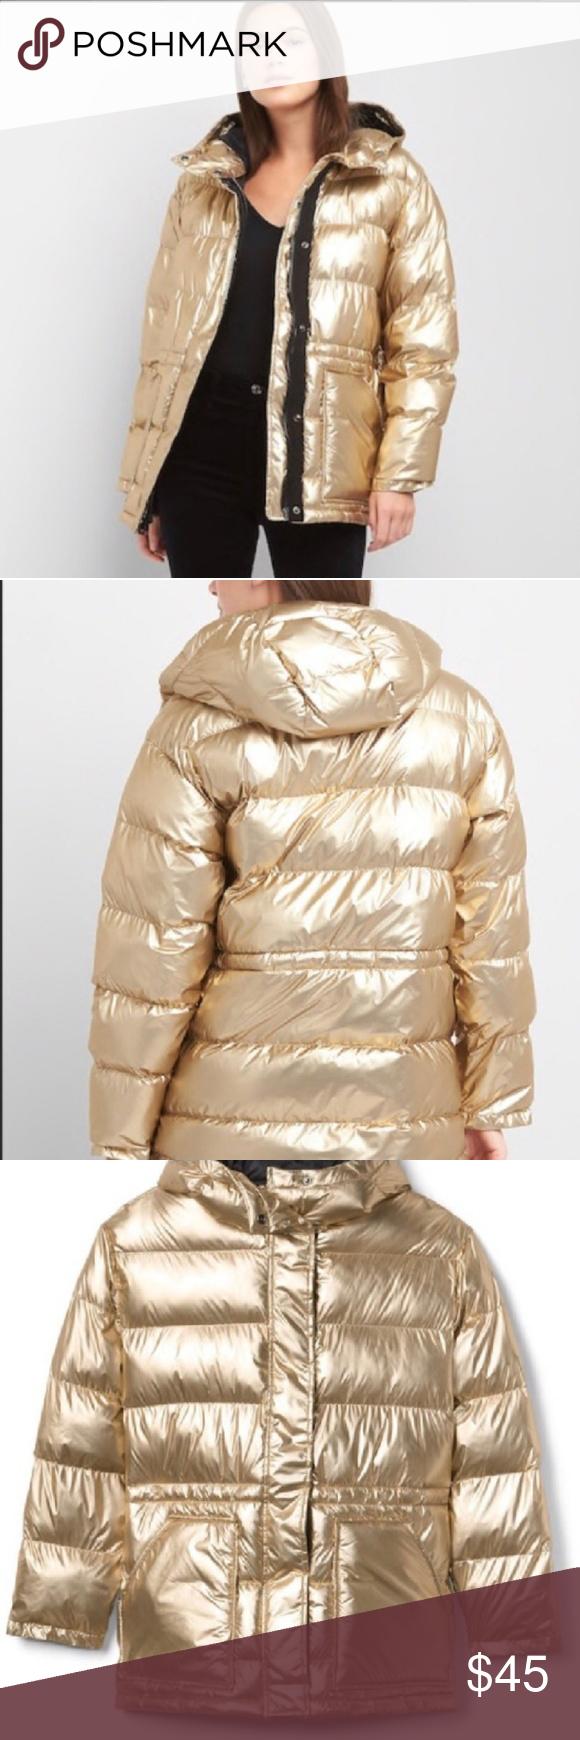 Gap Gold Cozy Puffer Coat Down Alternative Euc Clothes Design Fashion Outfits [ 1740 x 580 Pixel ]